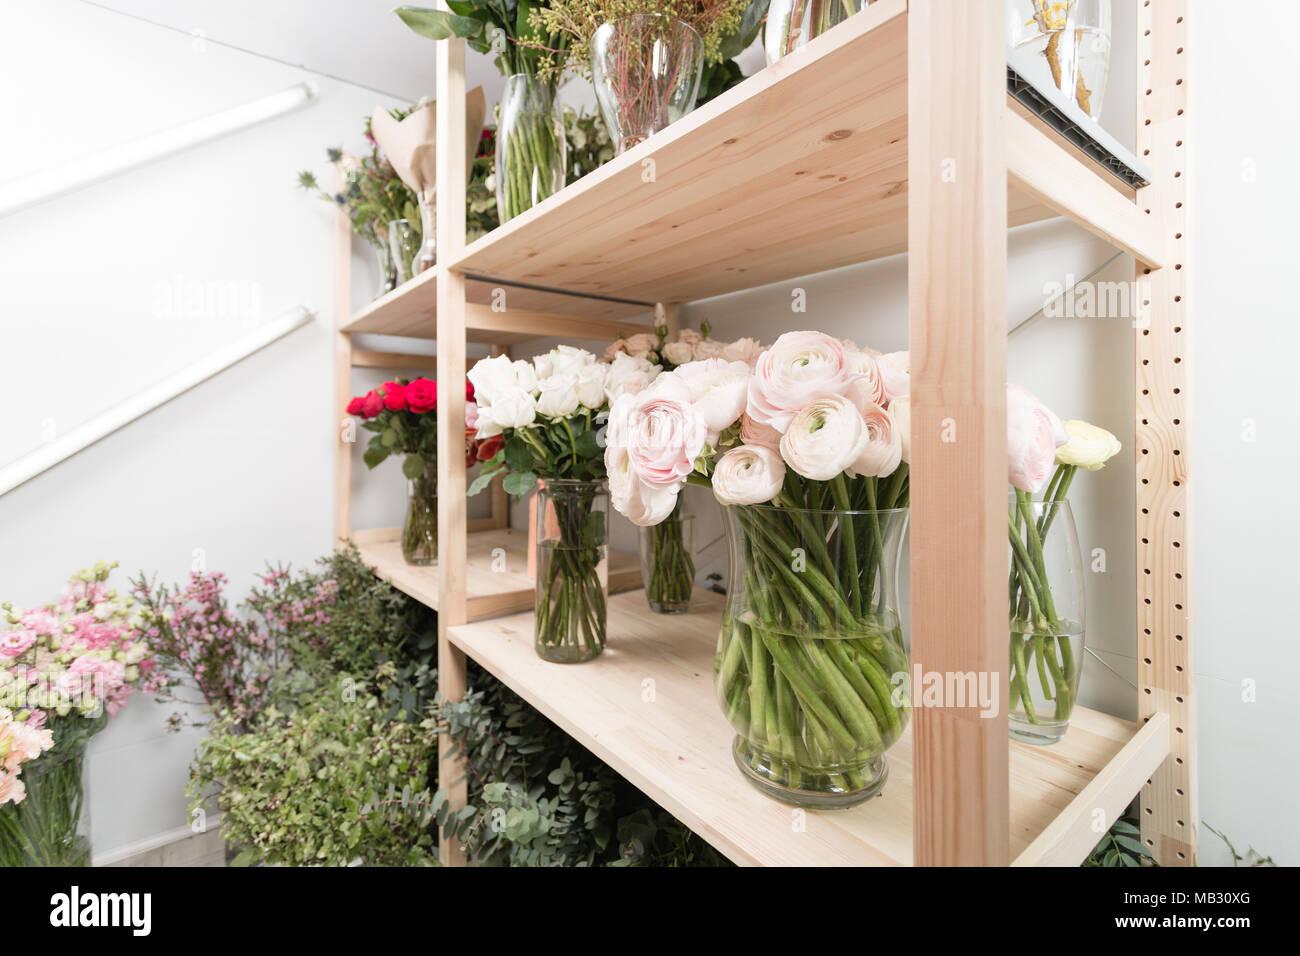 Different varieties fresh spring flowers in refrigerator for different varieties fresh spring flowers in refrigerator for flowers in flower shop bouquets on shelf florist business mightylinksfo